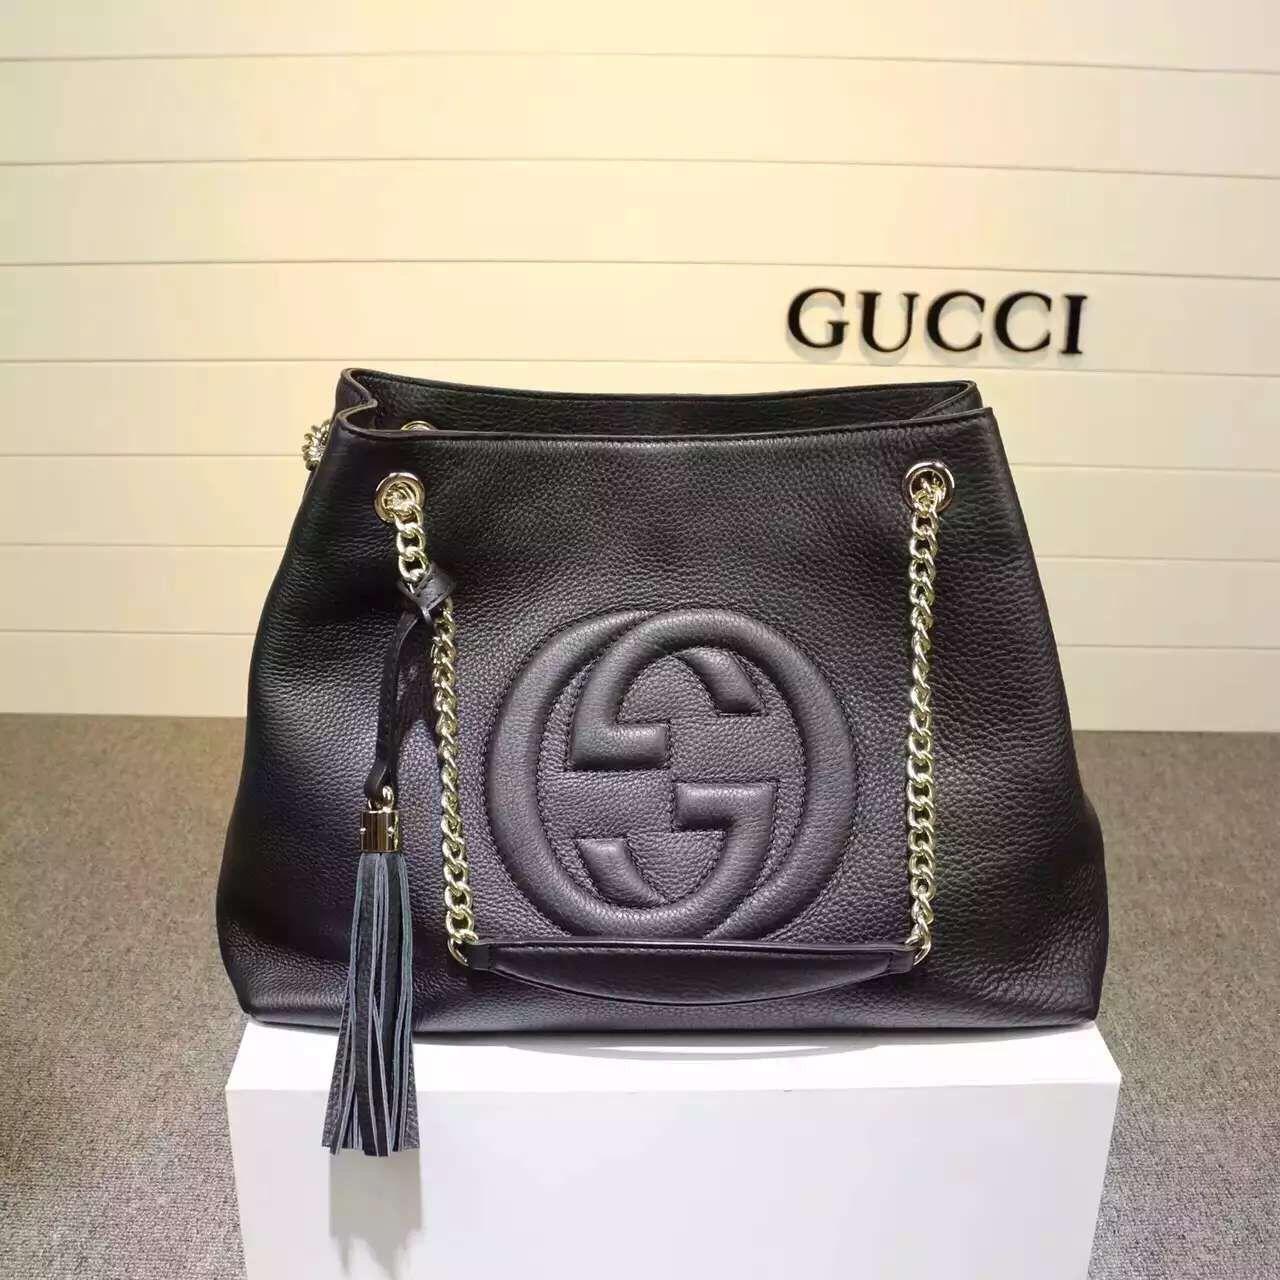 0e84f2fb1451 Gucci 308982 Medium Soho Calfskin Tote Bag Black